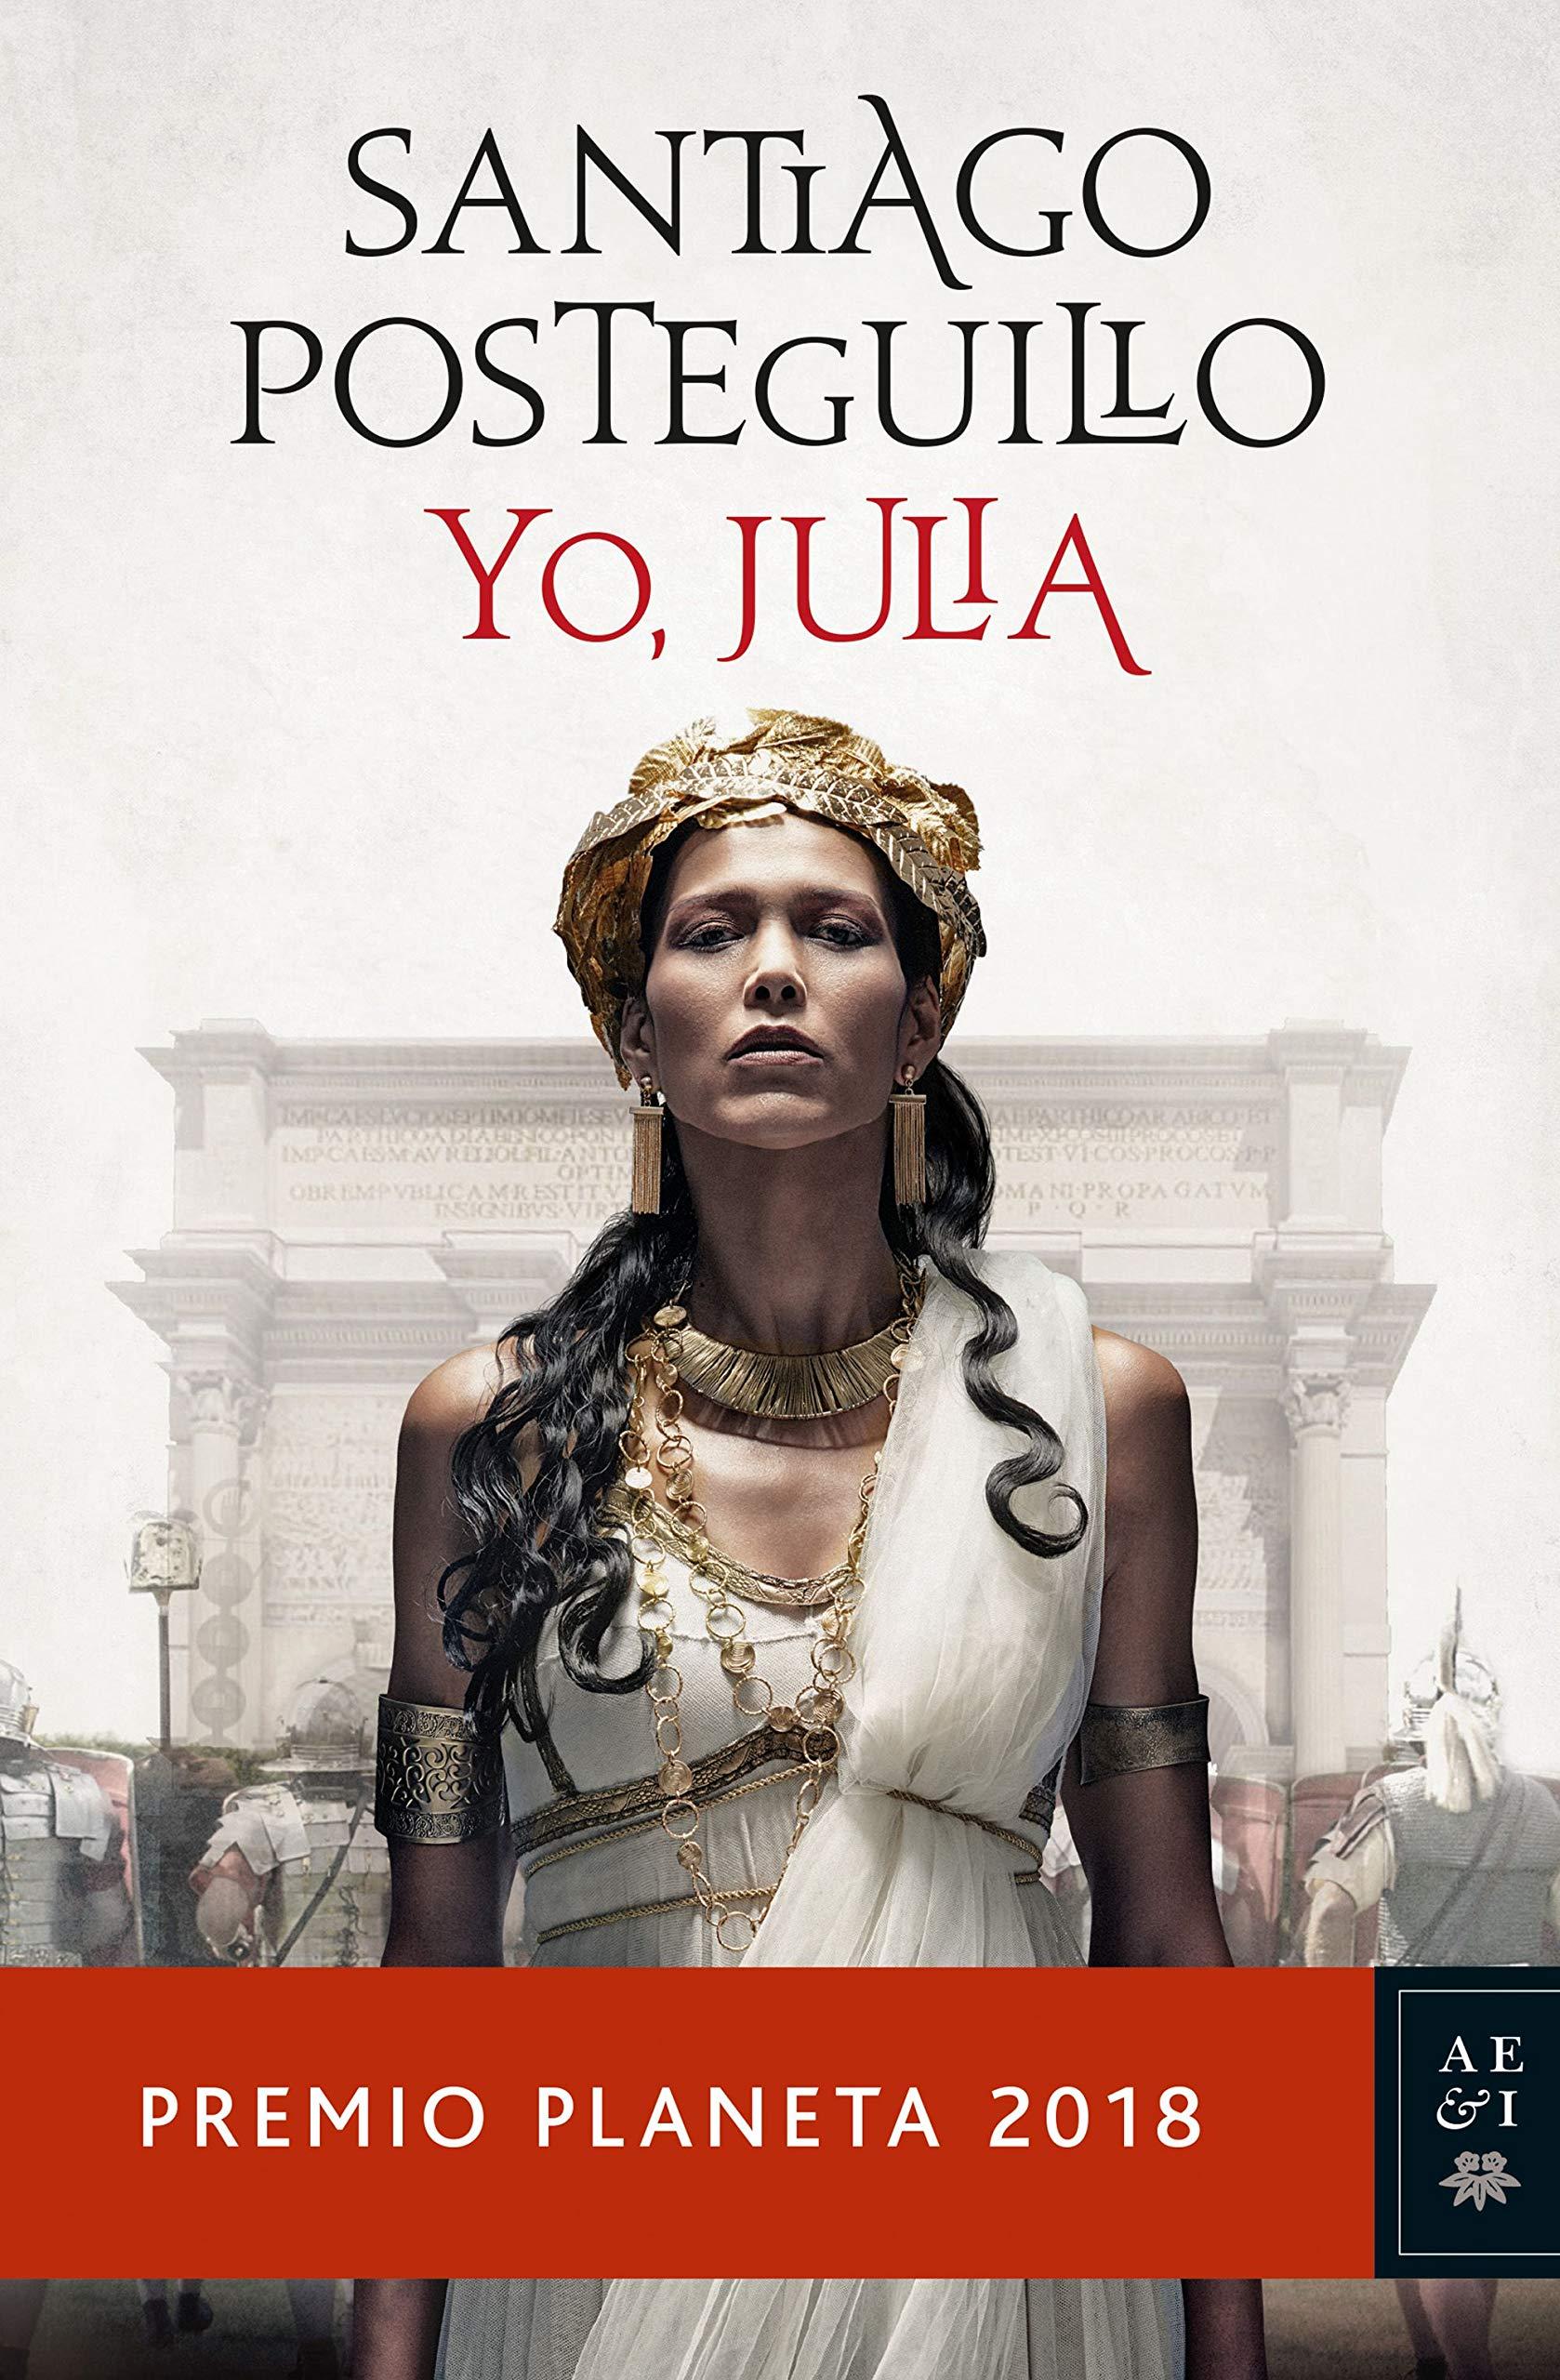 Yo, Julia (Santiago Posteguillo, 2018)